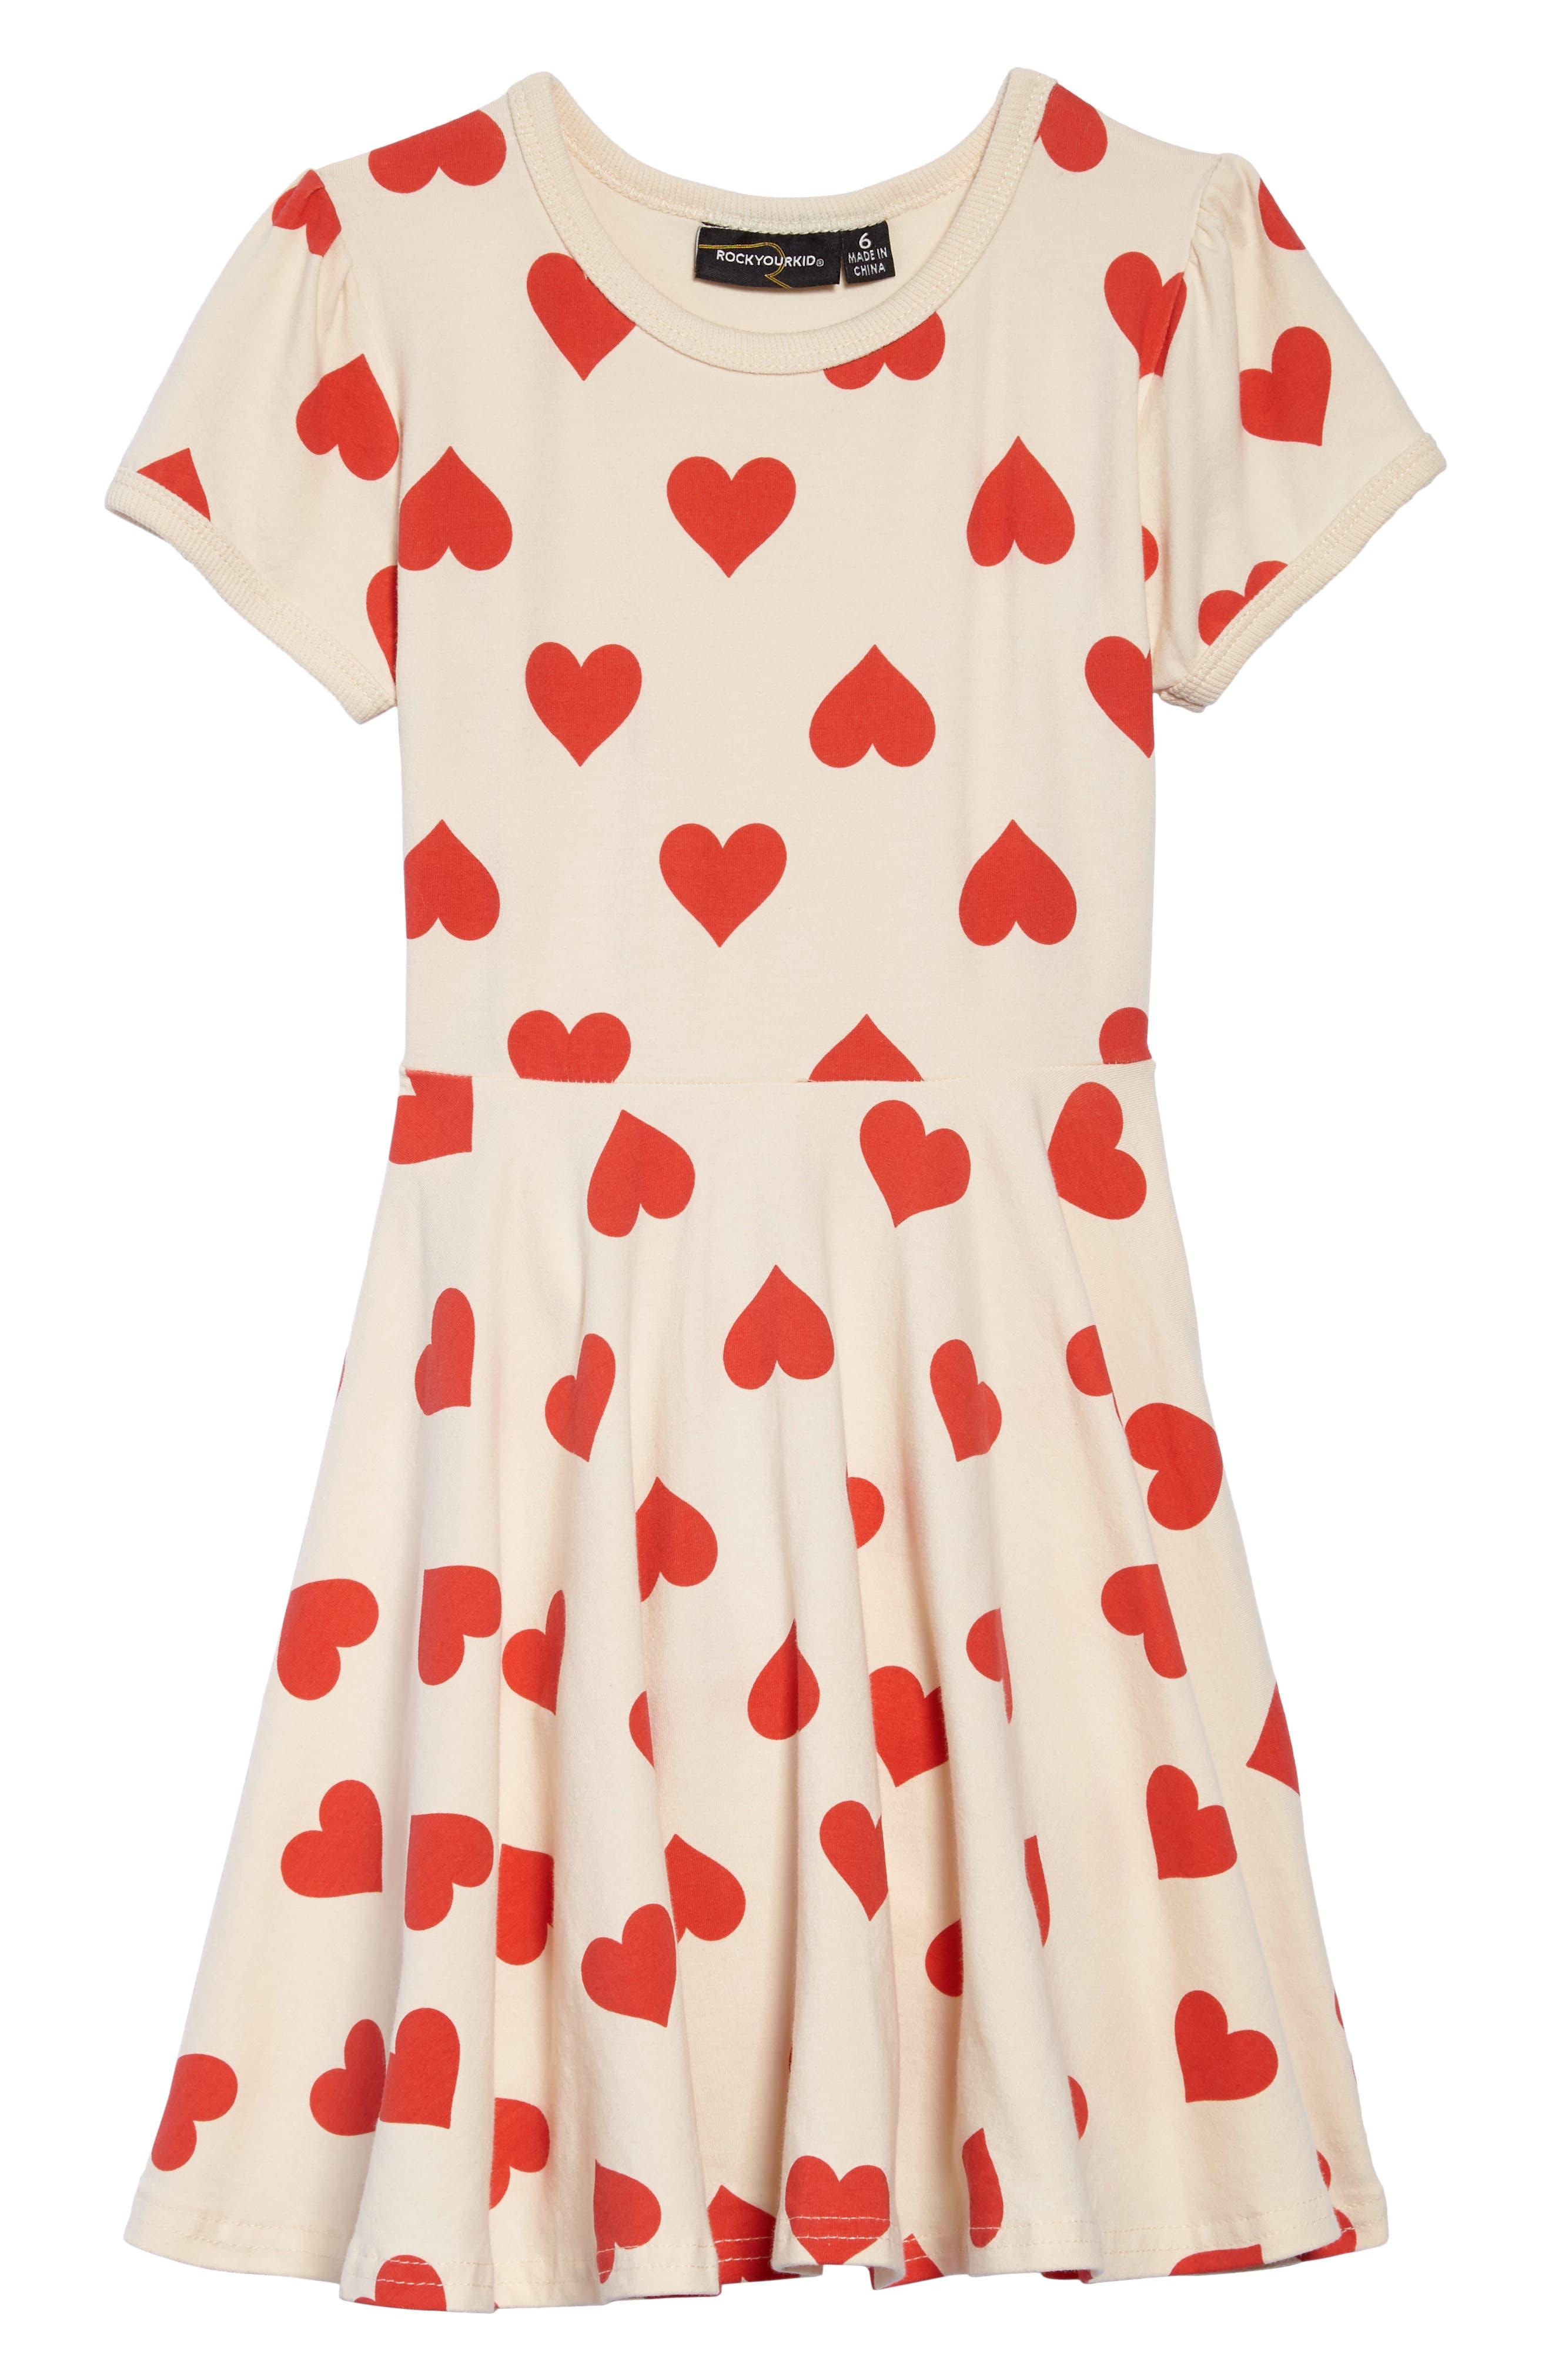 Alternate Image 1 Selected - Rock Your Kid Sweetheart Dress (Toddler Girls & Little Girls)